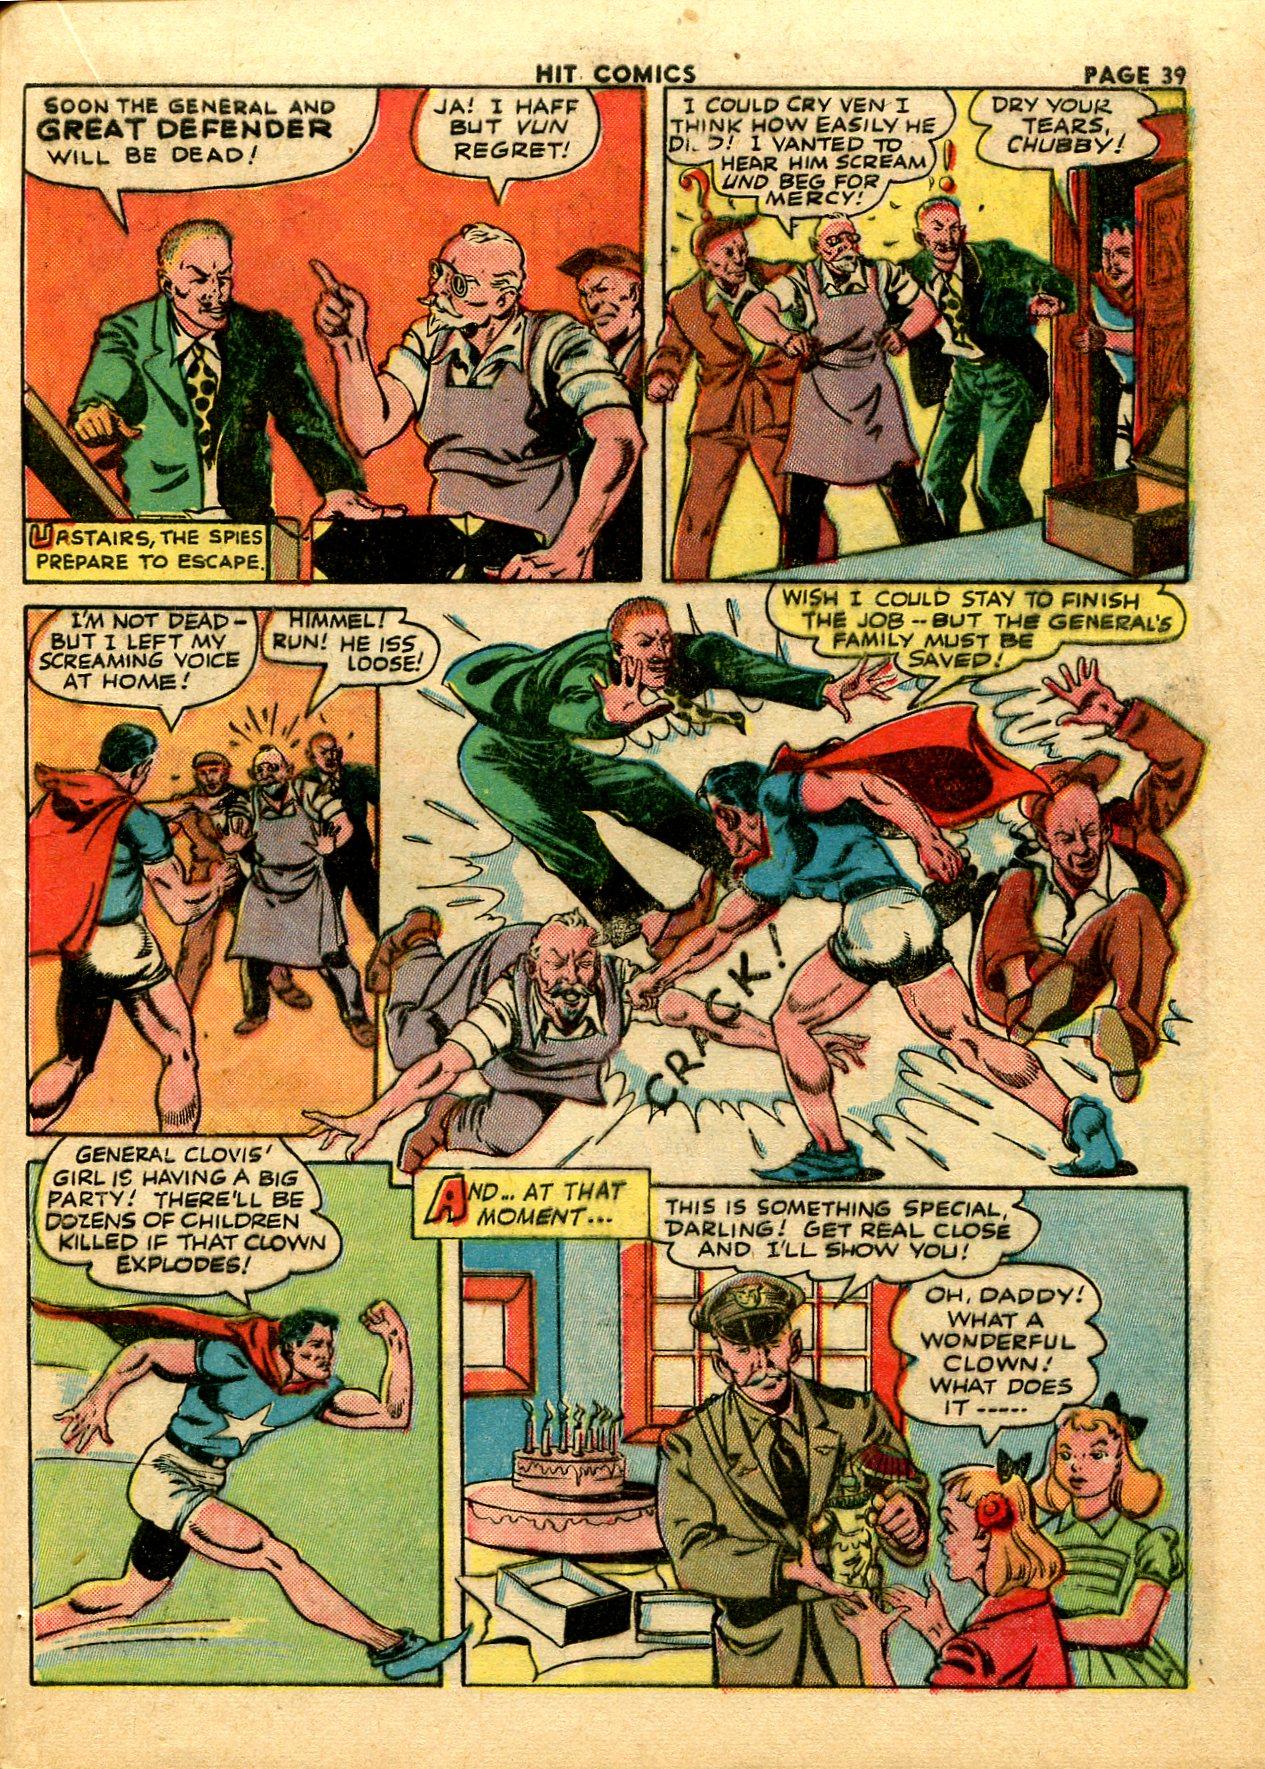 Read online Hit Comics comic -  Issue #28 - 42